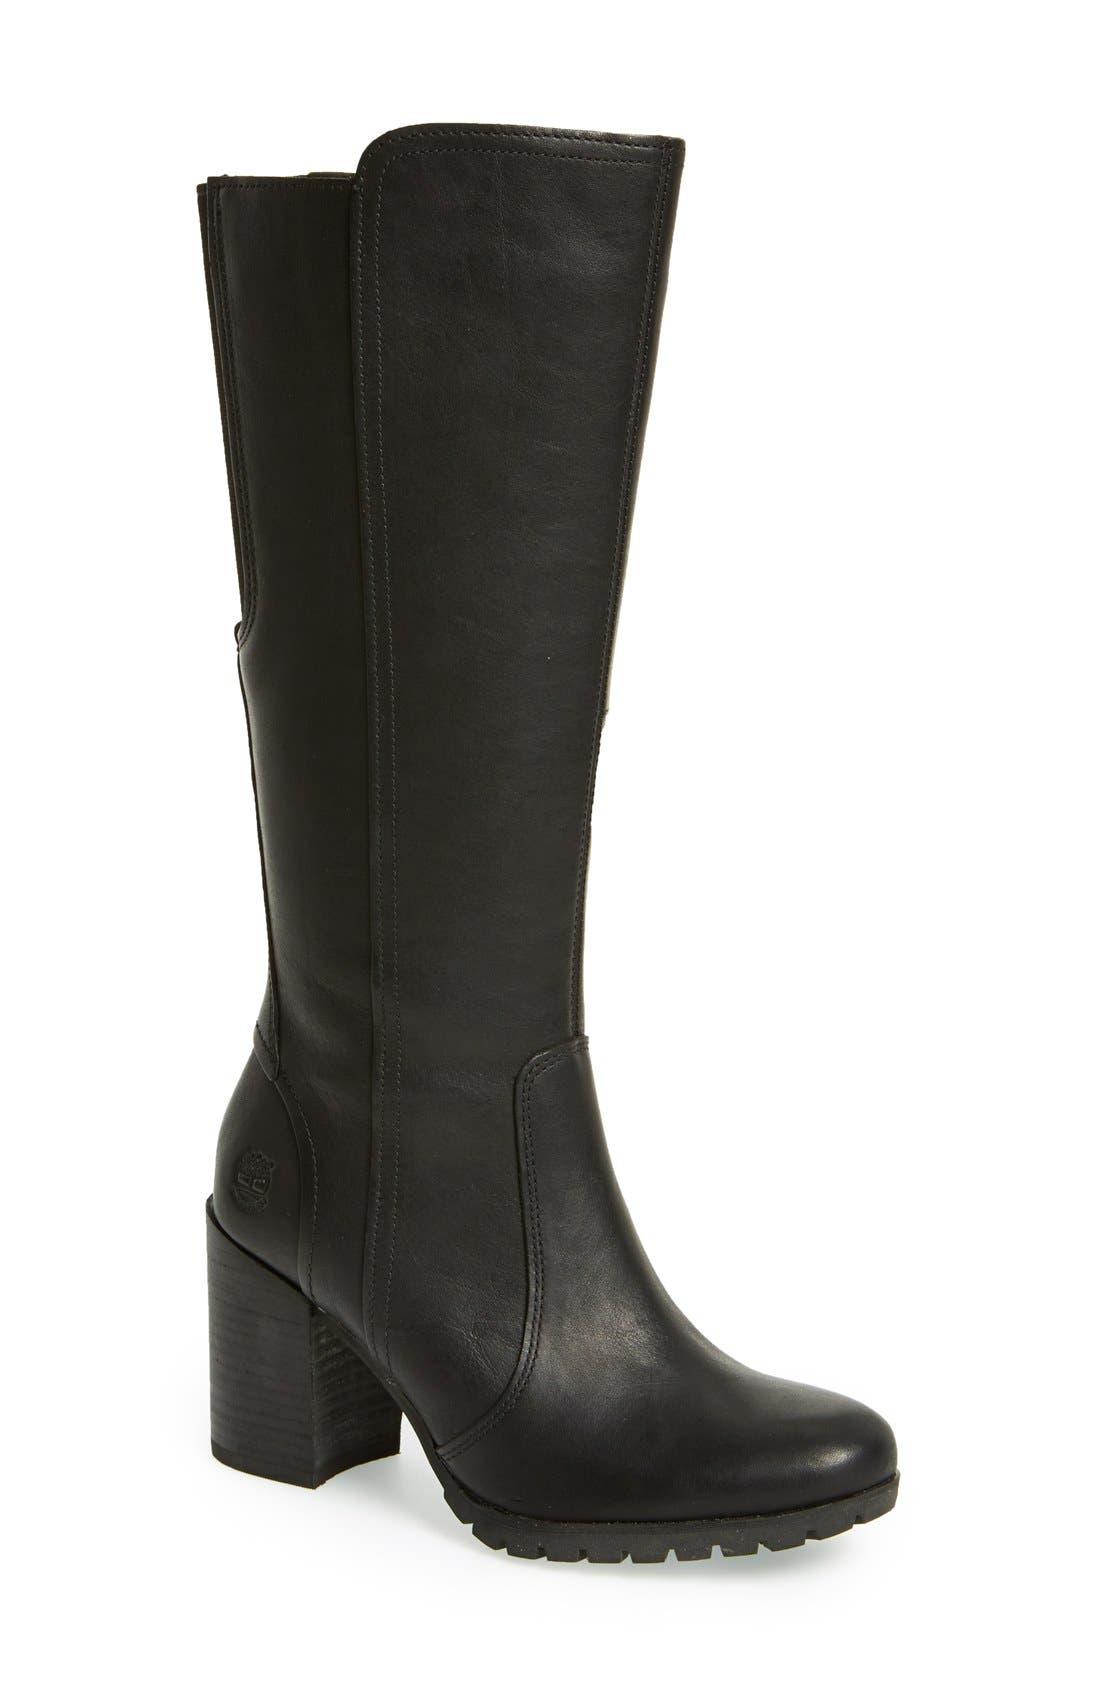 Main Image - Timberland 'Swazey' Tall Waterproof Boot (Women)